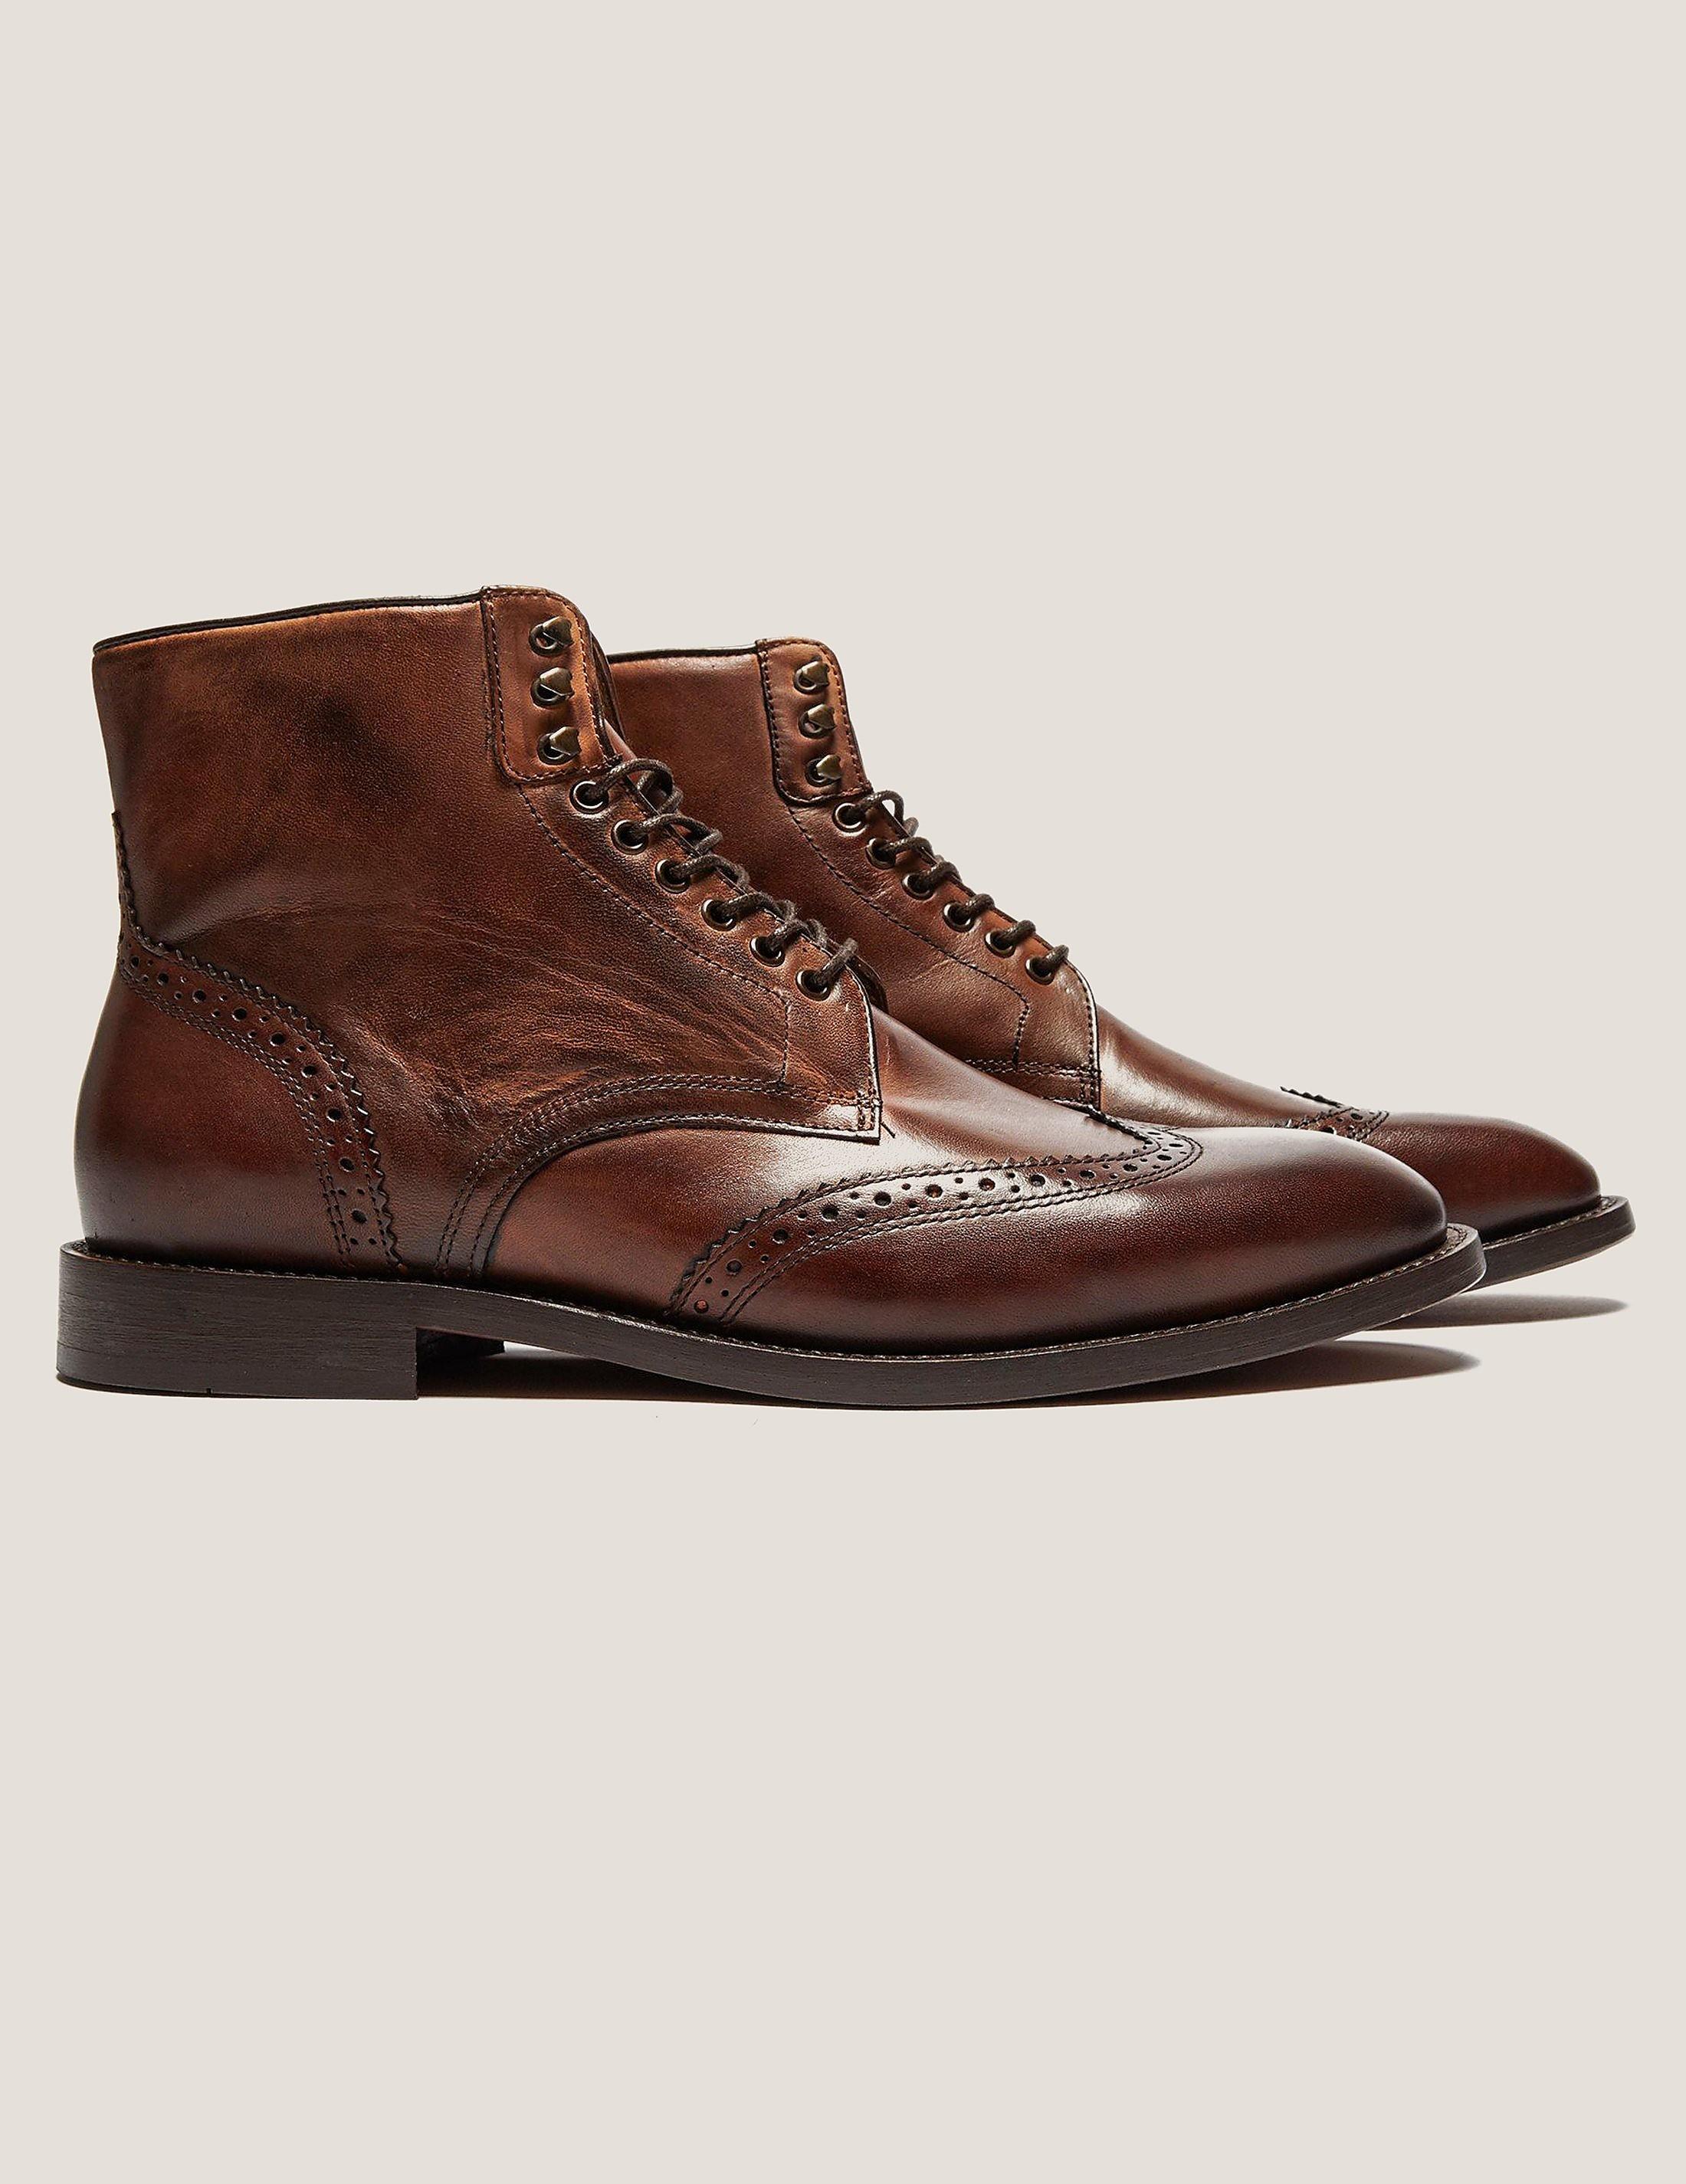 H by Hudson Greenham Boot